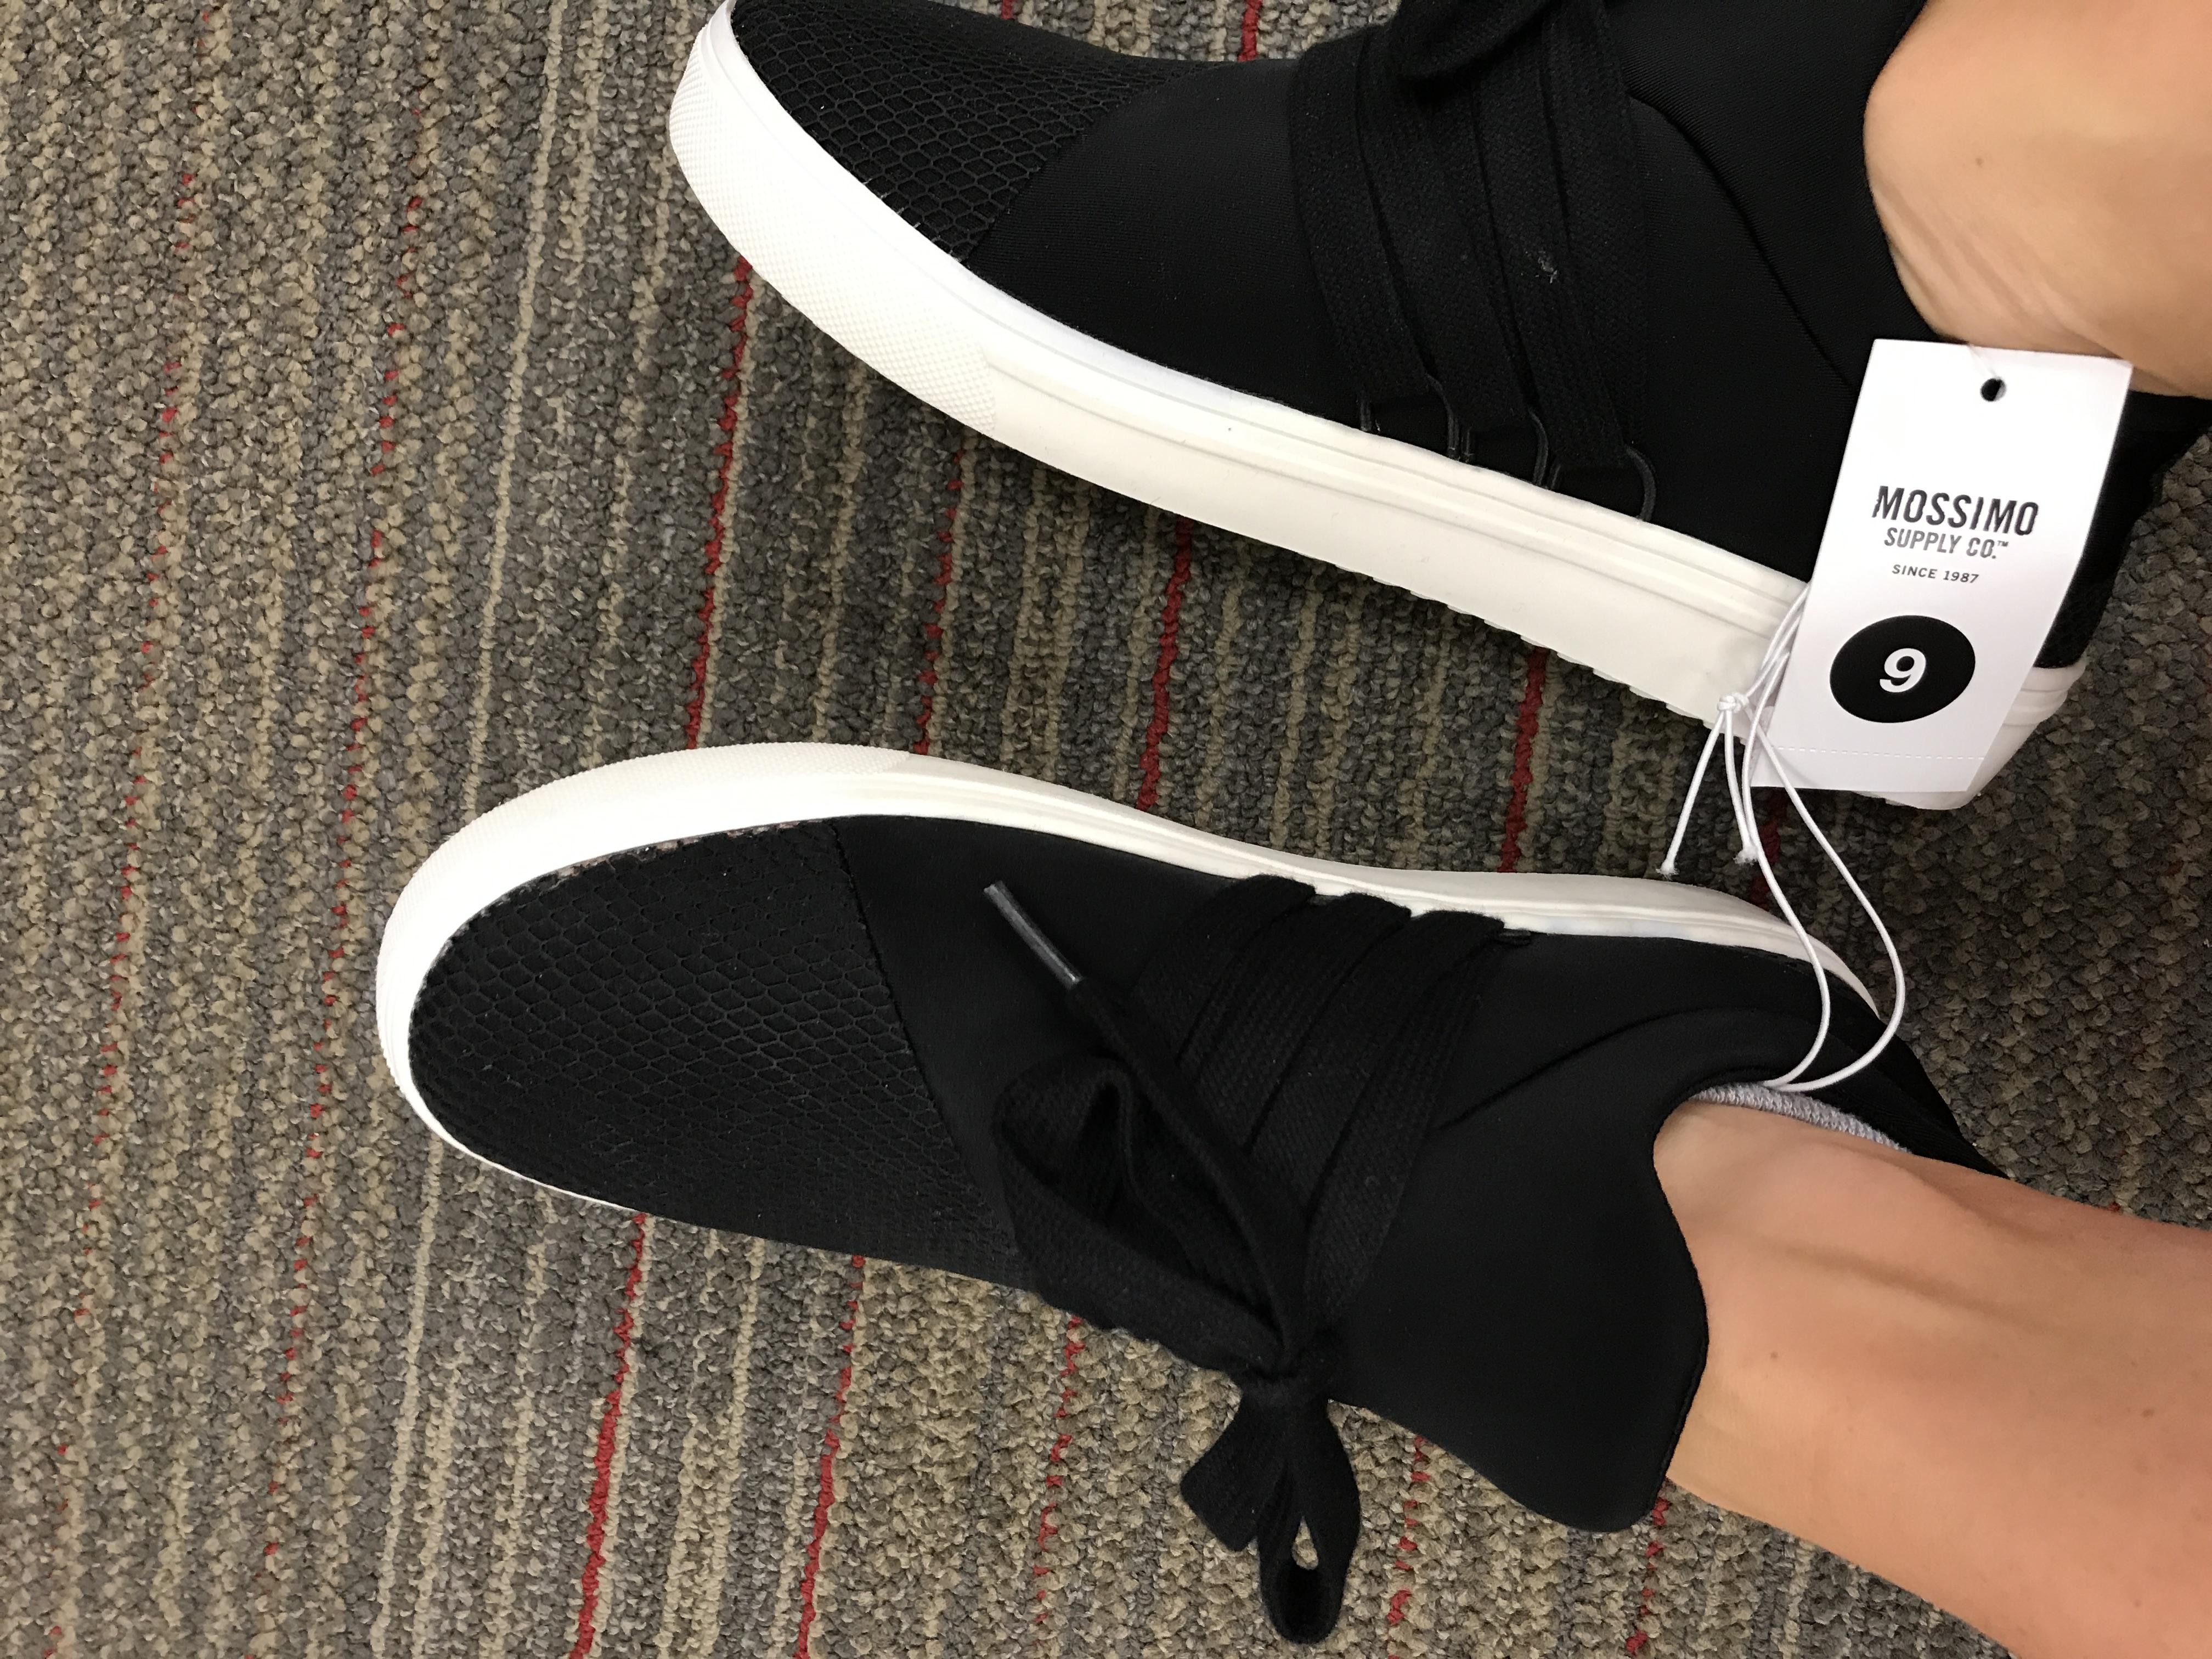 Target Lancer Sneaker Dupe - Best Target Shoe Dupes - Communikait by Kait Hanson